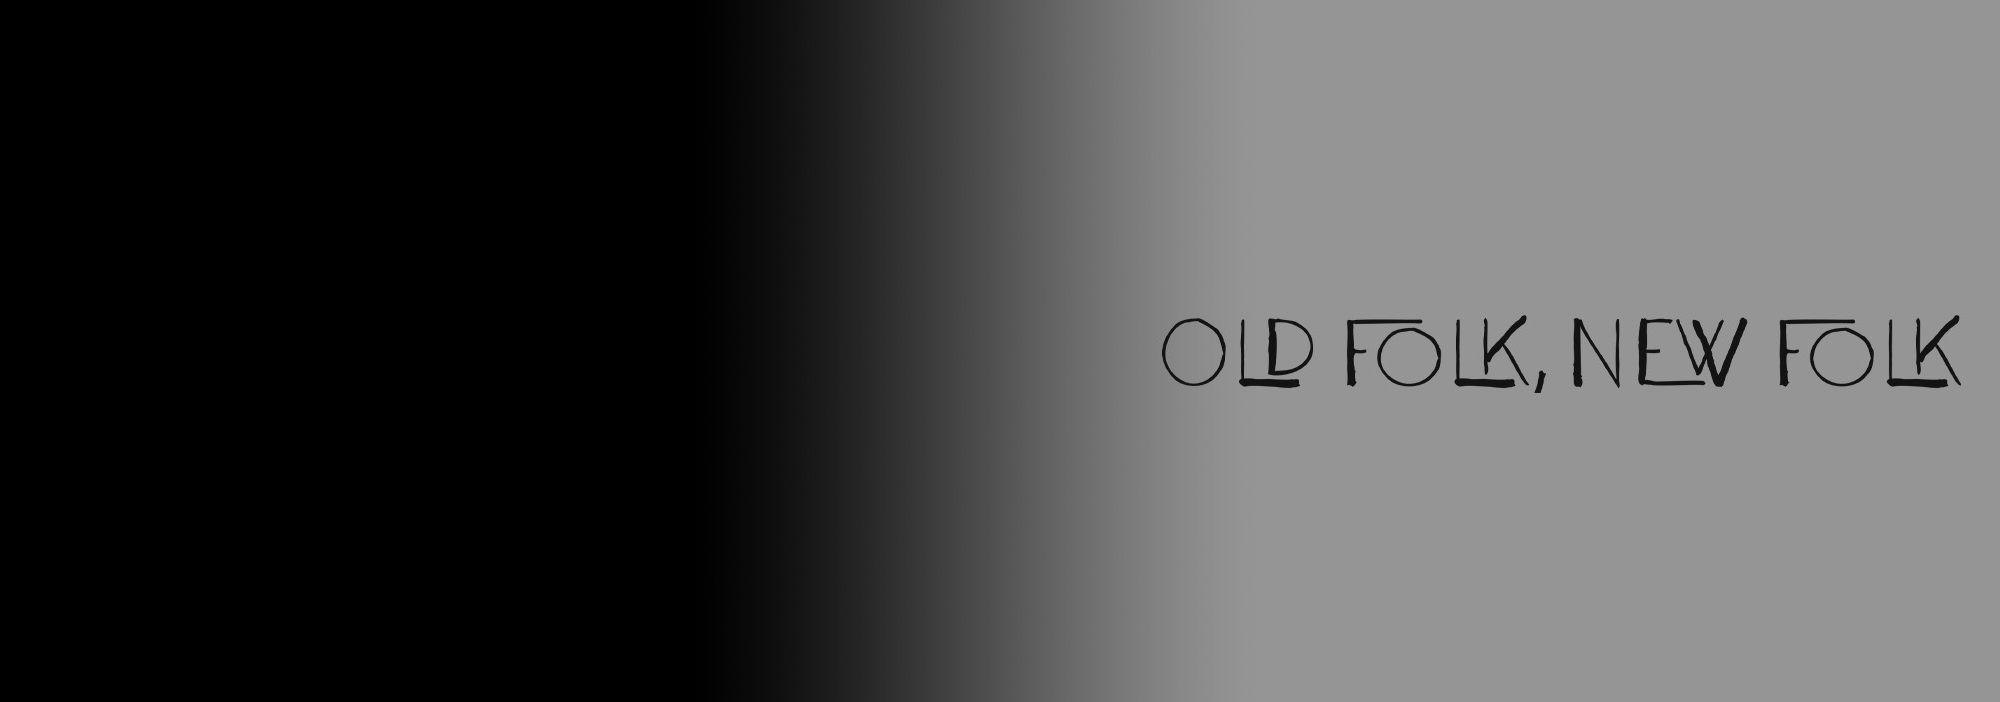 OldFolkNewFolk